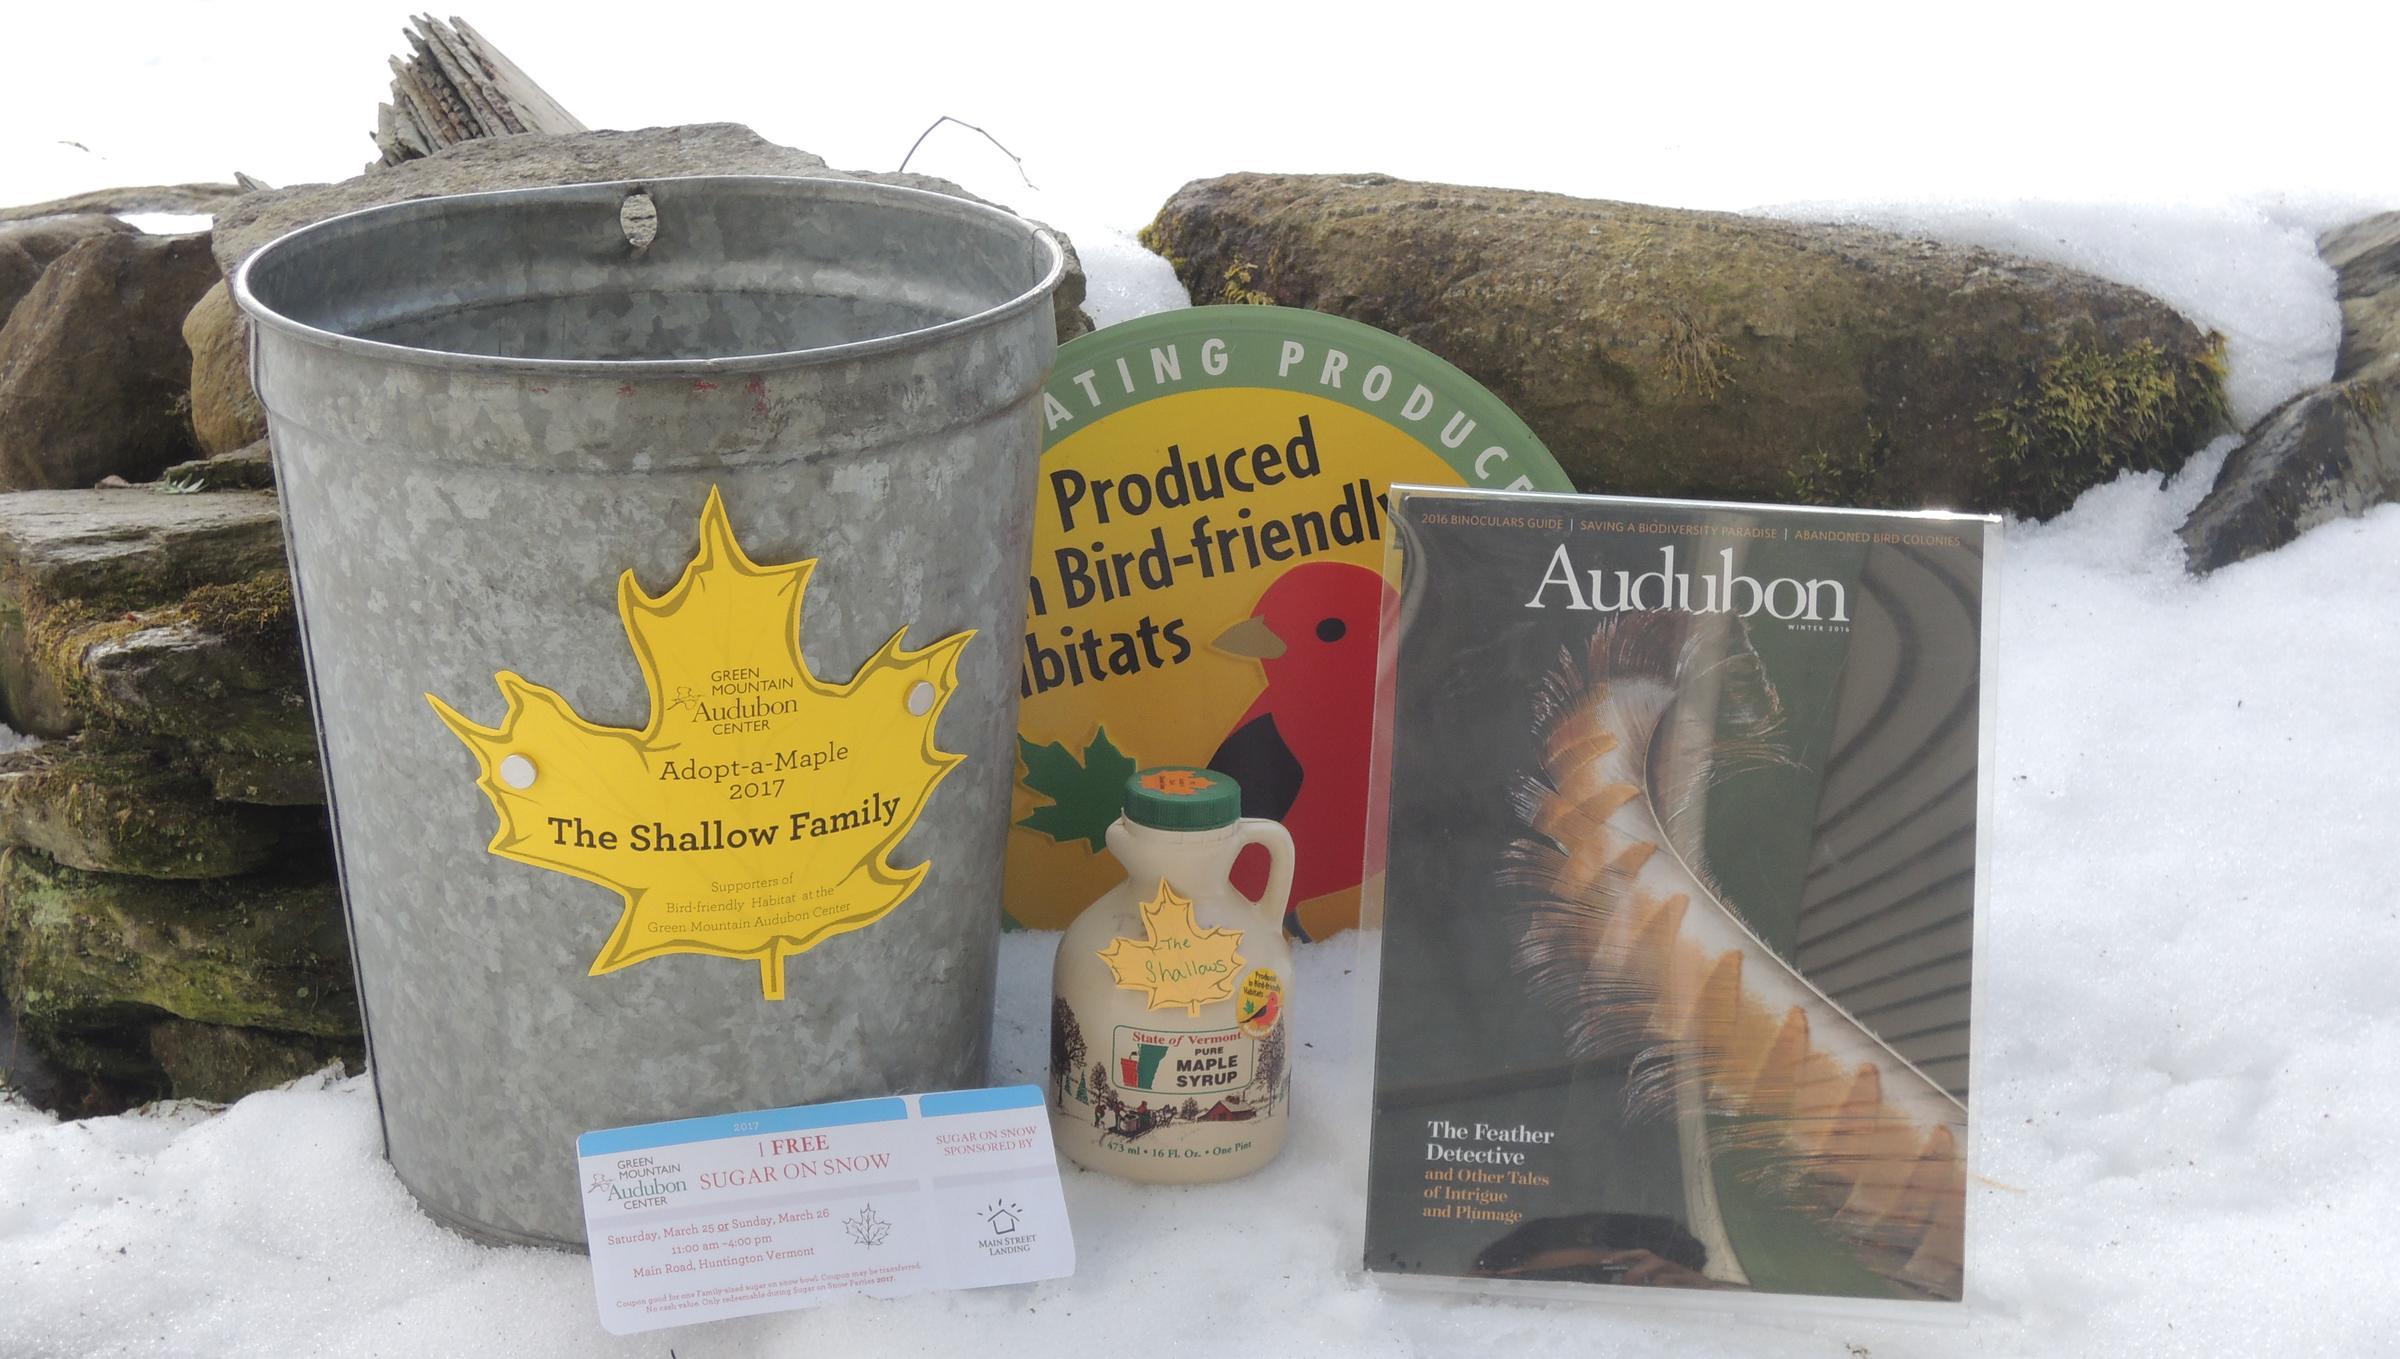 Audubon Vermont Adopt-a-Maple